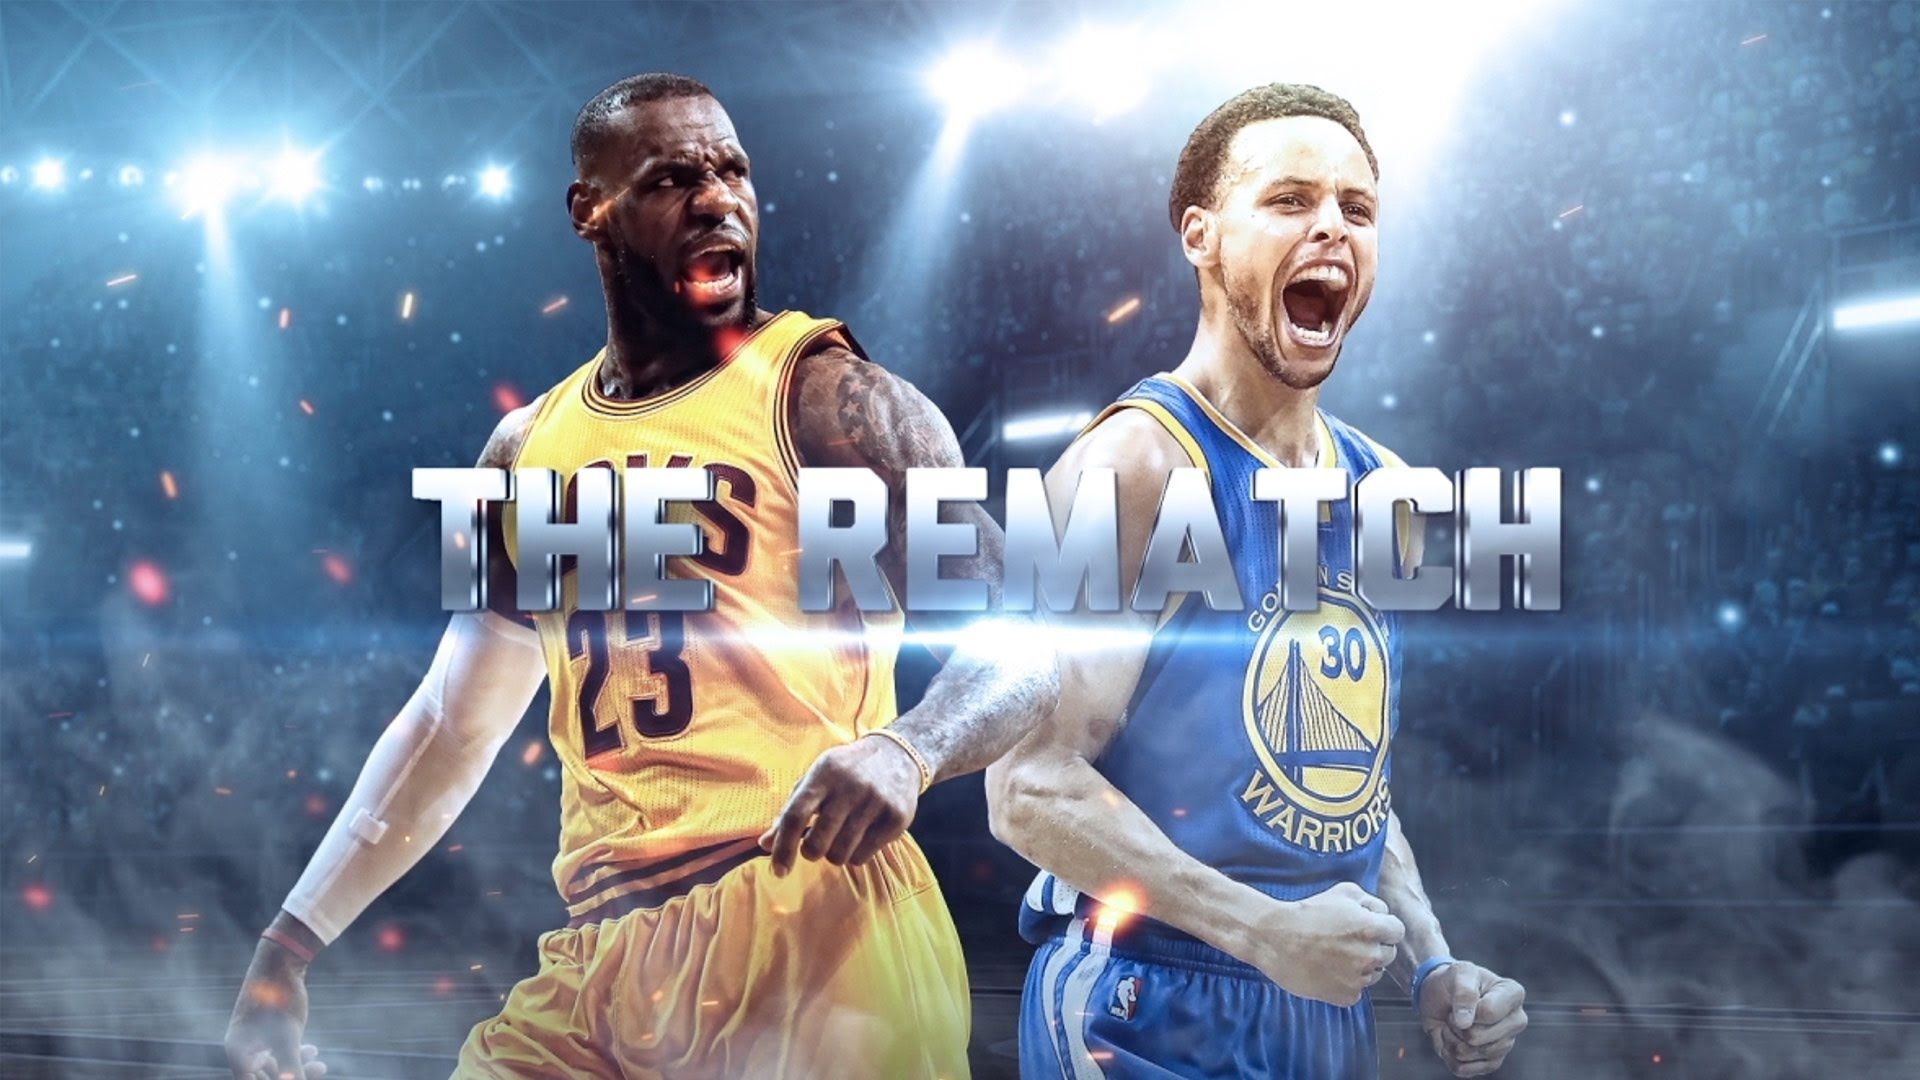 2017 Nba Finals Warriors Vs Cavaliers The Rematch Nba Finals 2017 Nba Finals Nba